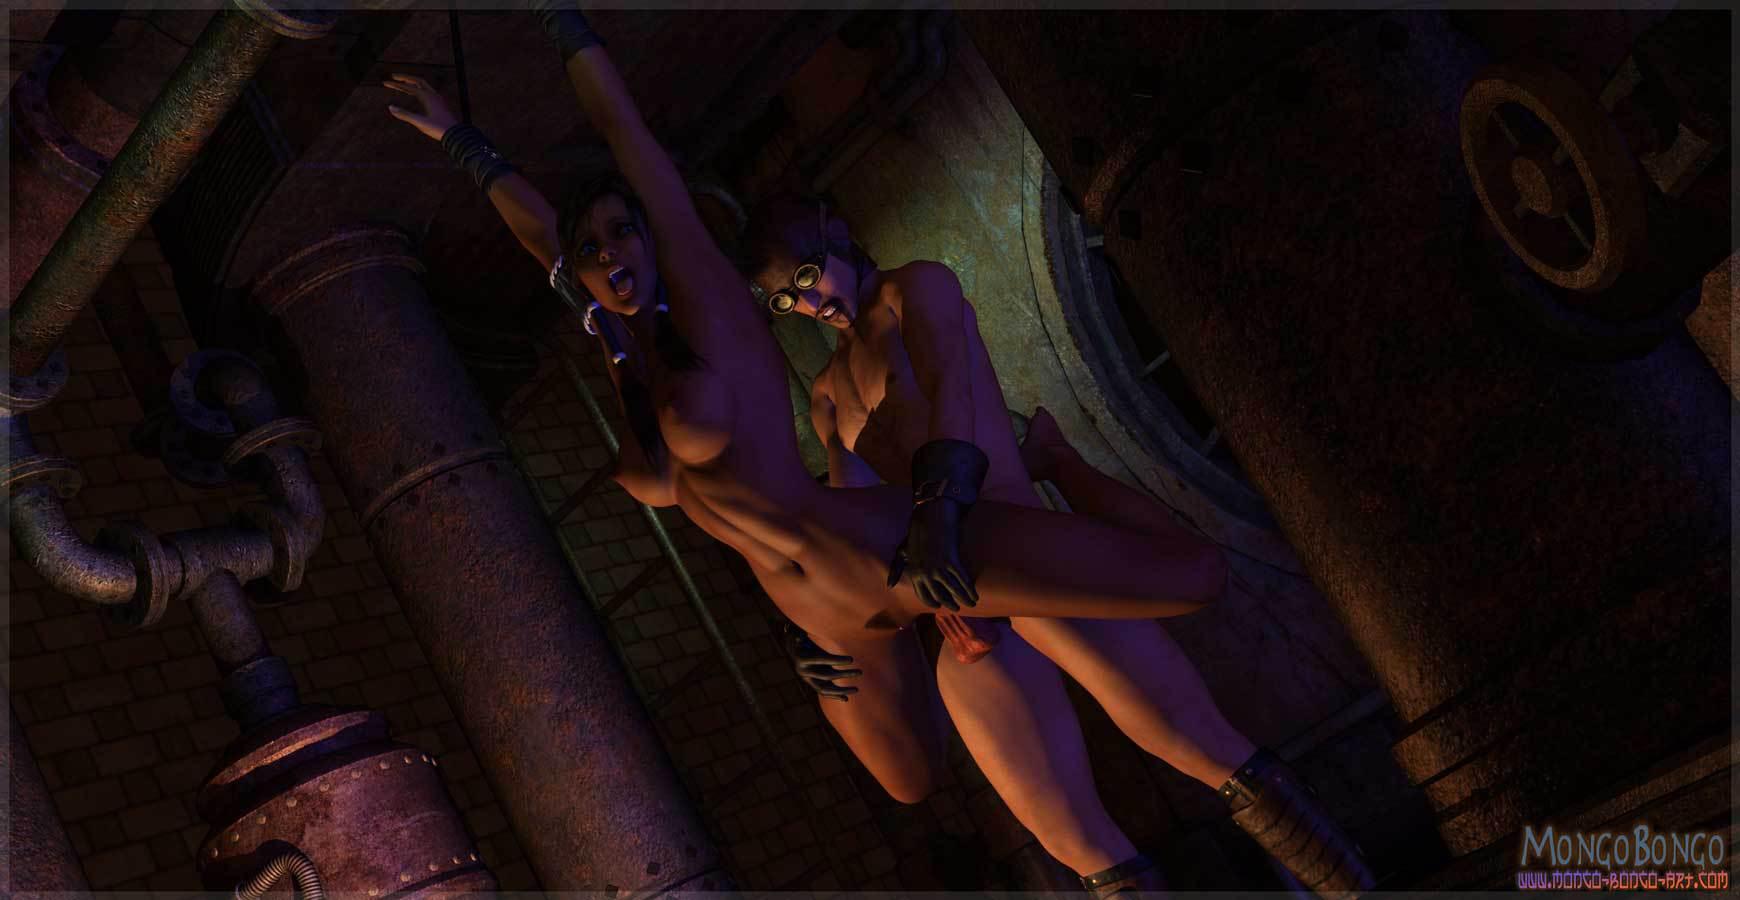 legend sinbad of the magi The binding of isaac gemini